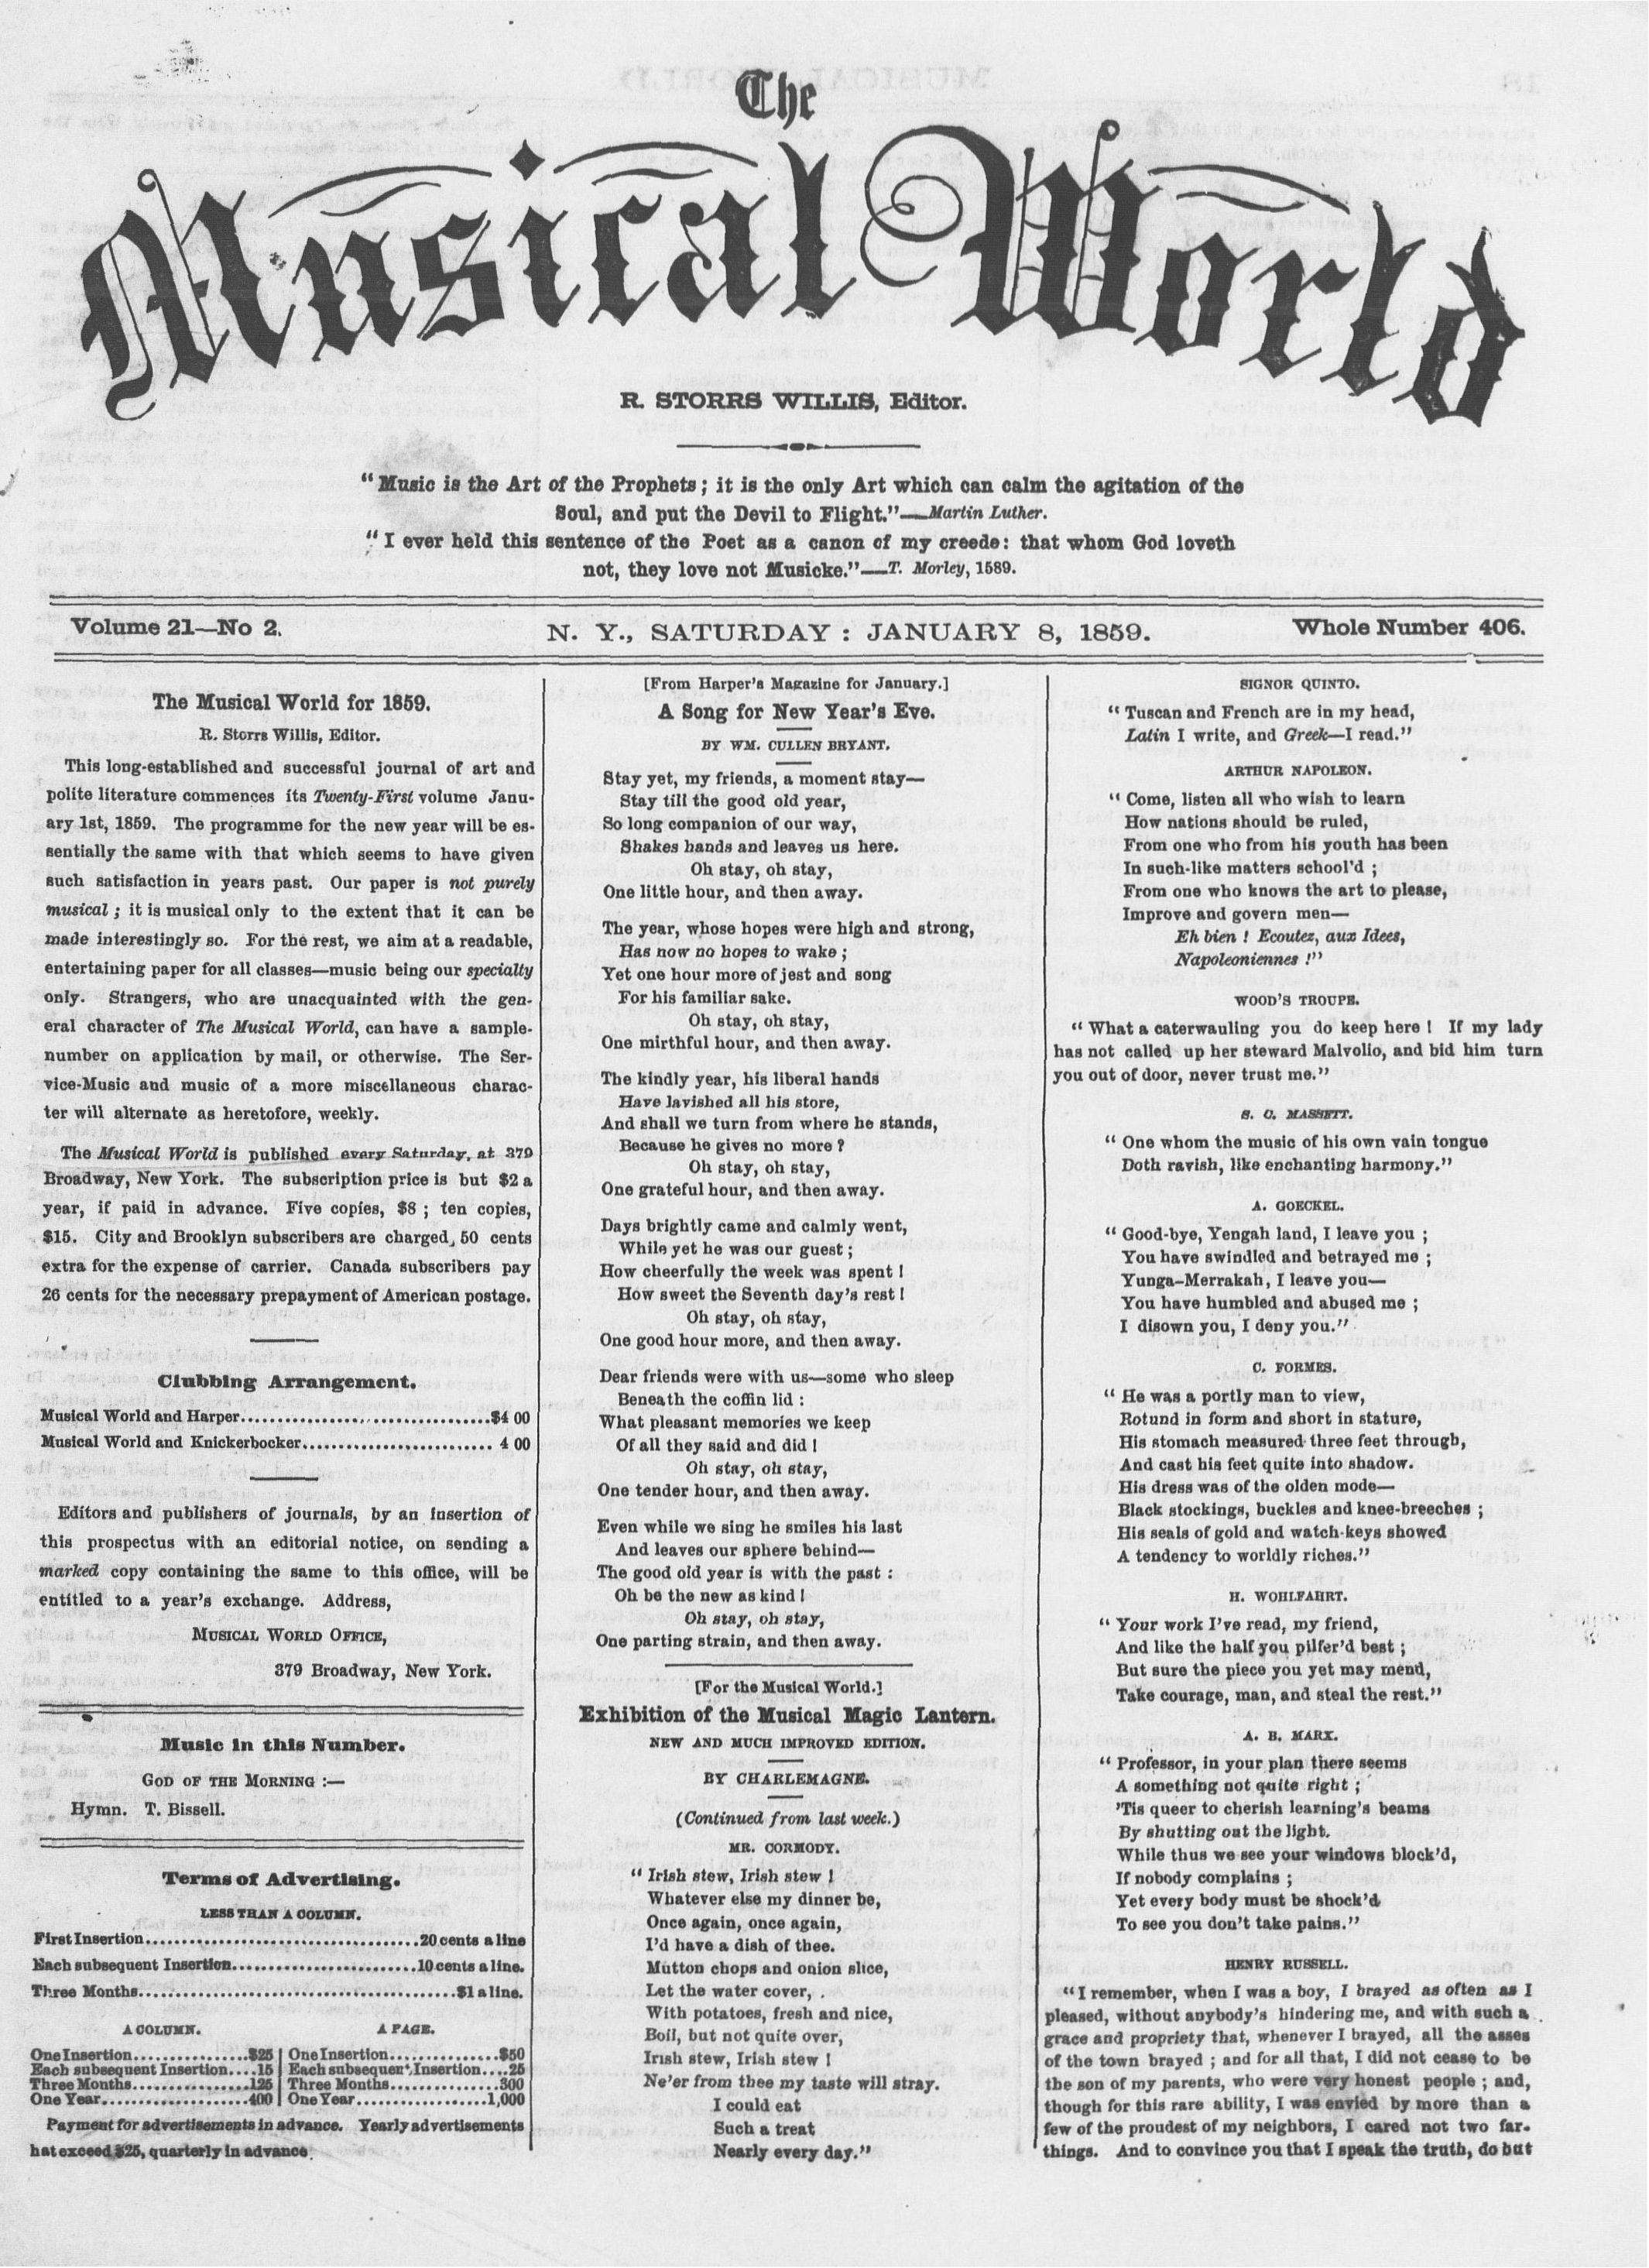 The Musical World, Vol  21, no  2, January 8, 1859 | Alexander